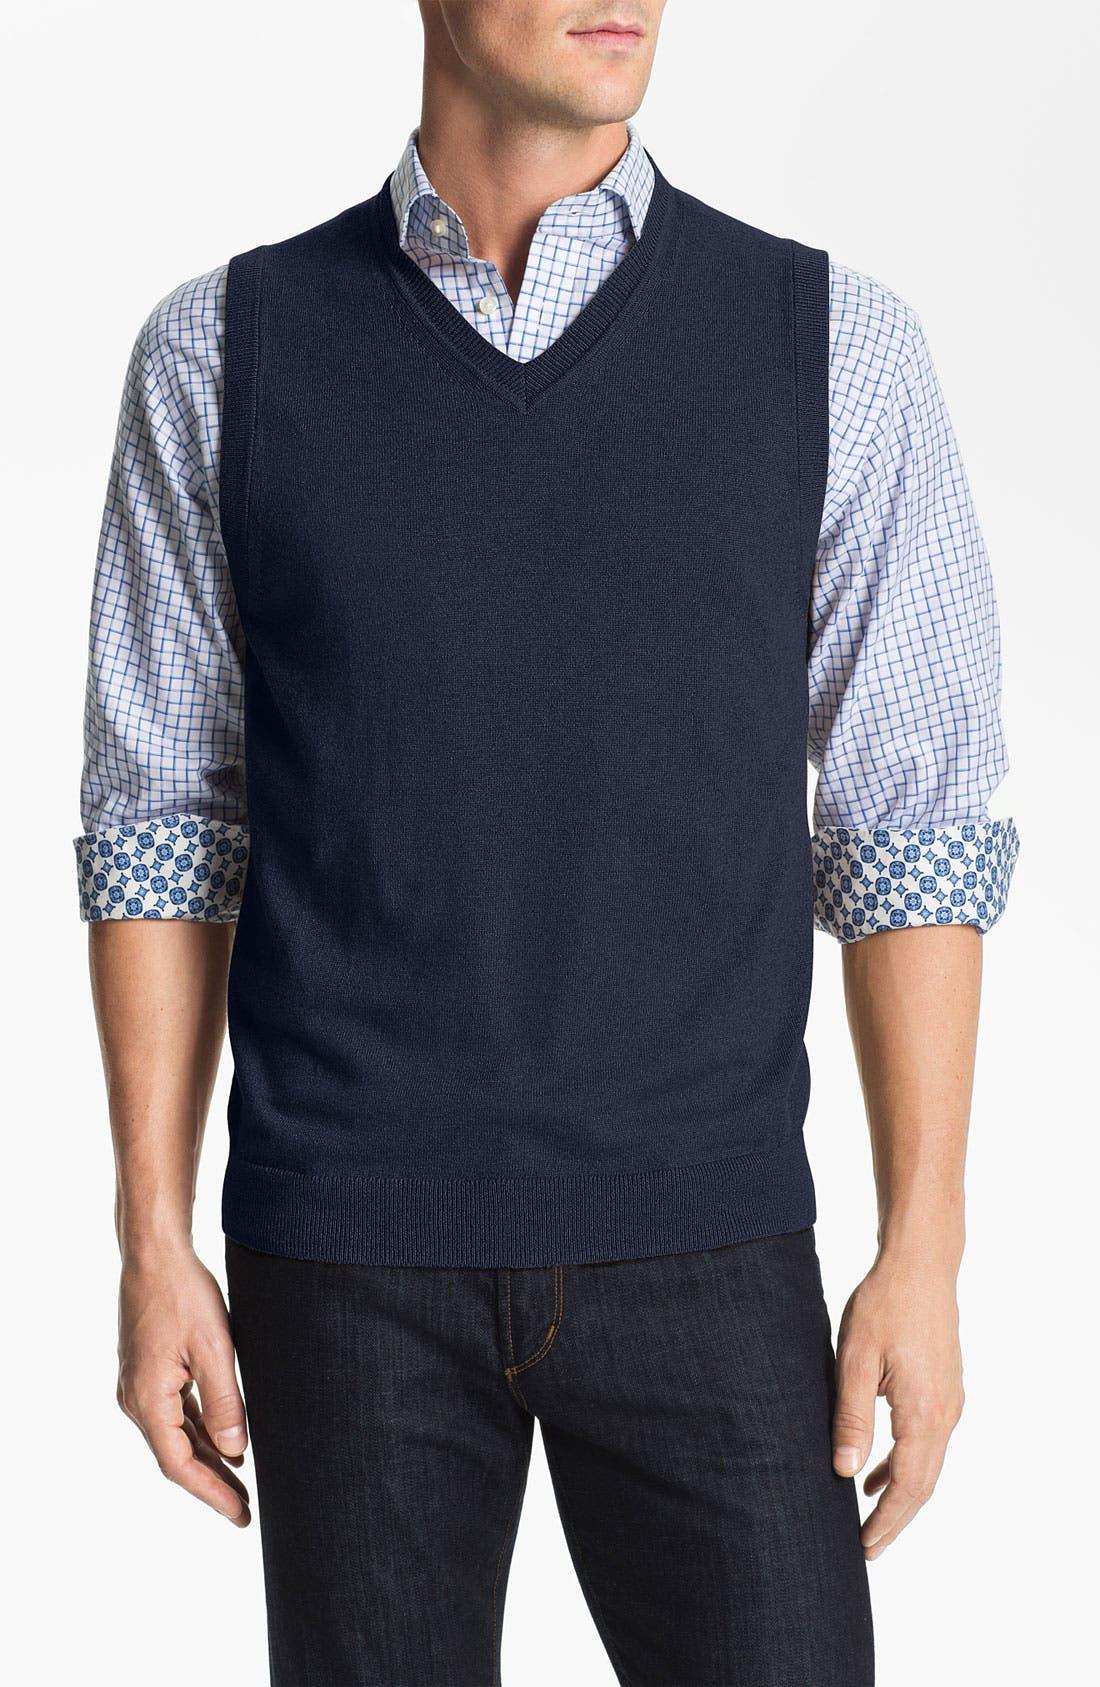 Main Image - Nordstrom Cotton & Cashmere Sweater Vest